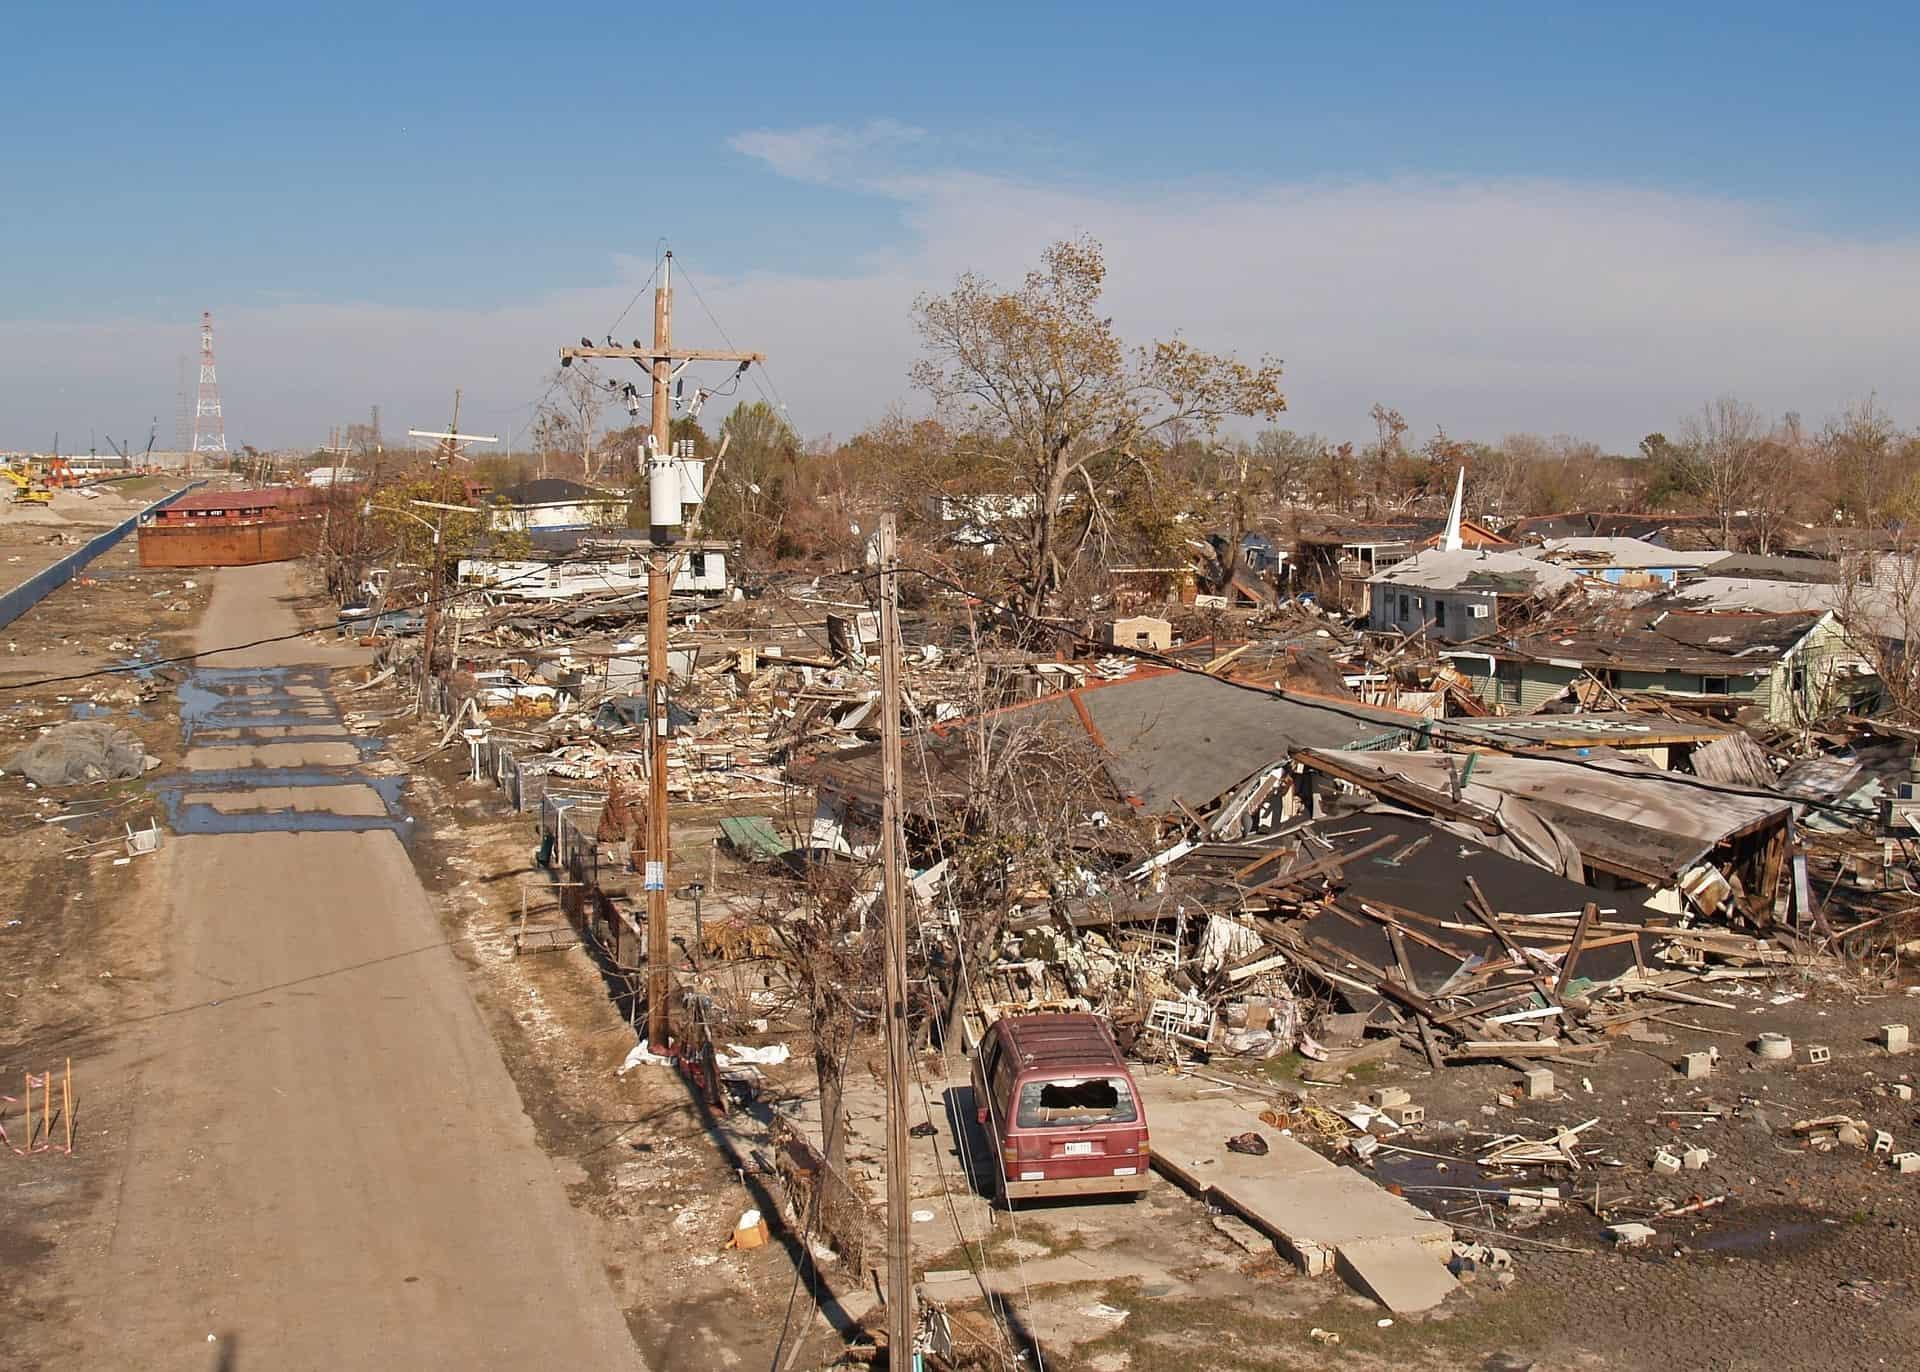 city rubble left by a tornado